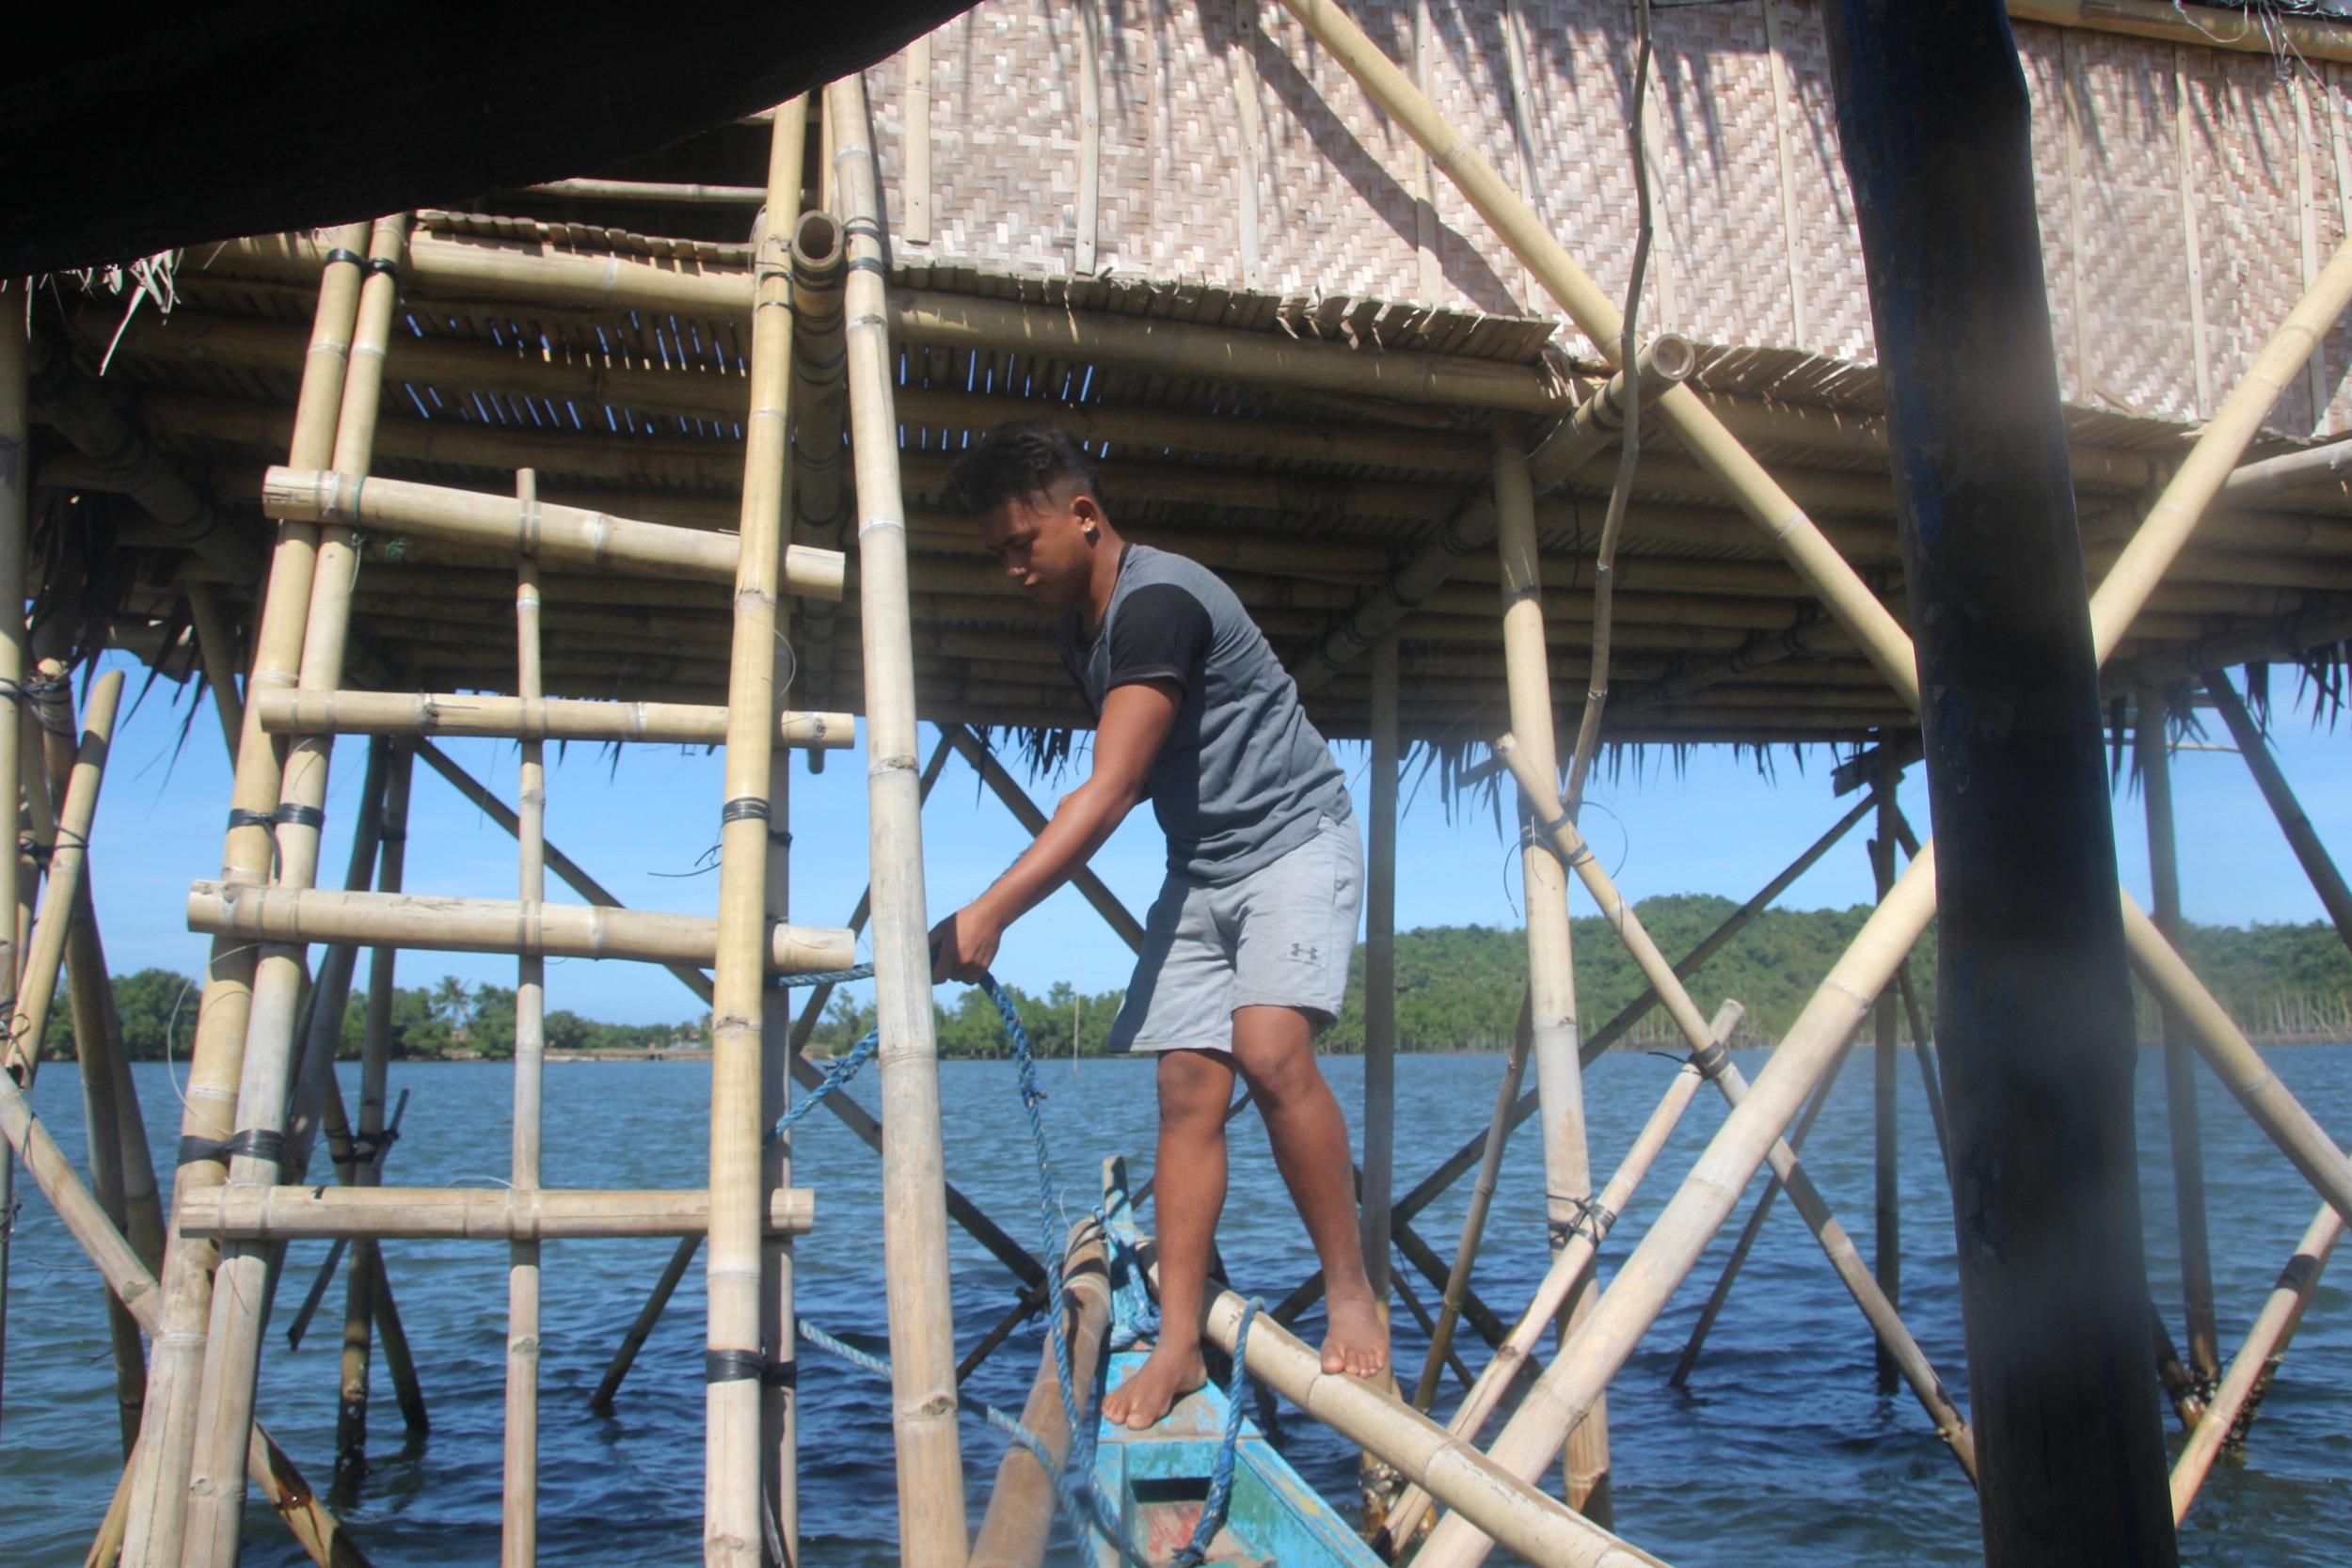 TinagongDagatIMG_8630.JPG